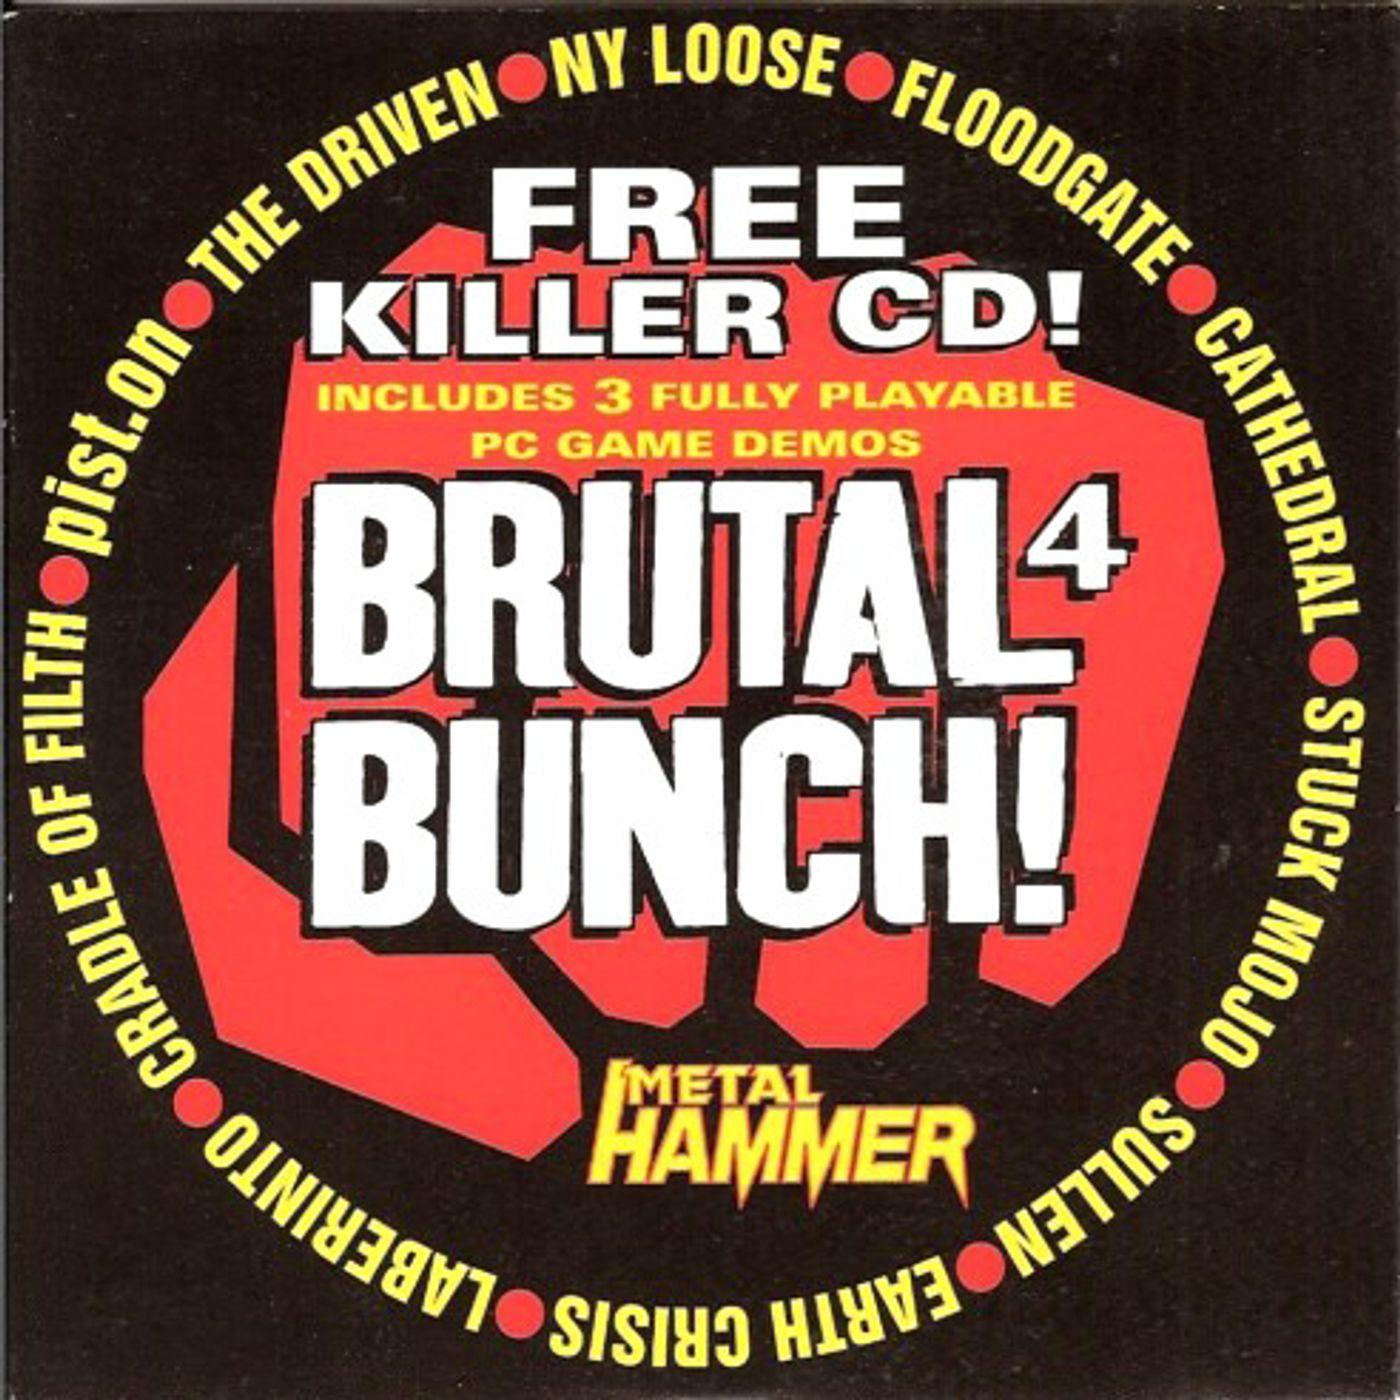 FWTMI14 - Westie selects Metal Hammer Brutal Bunch 4